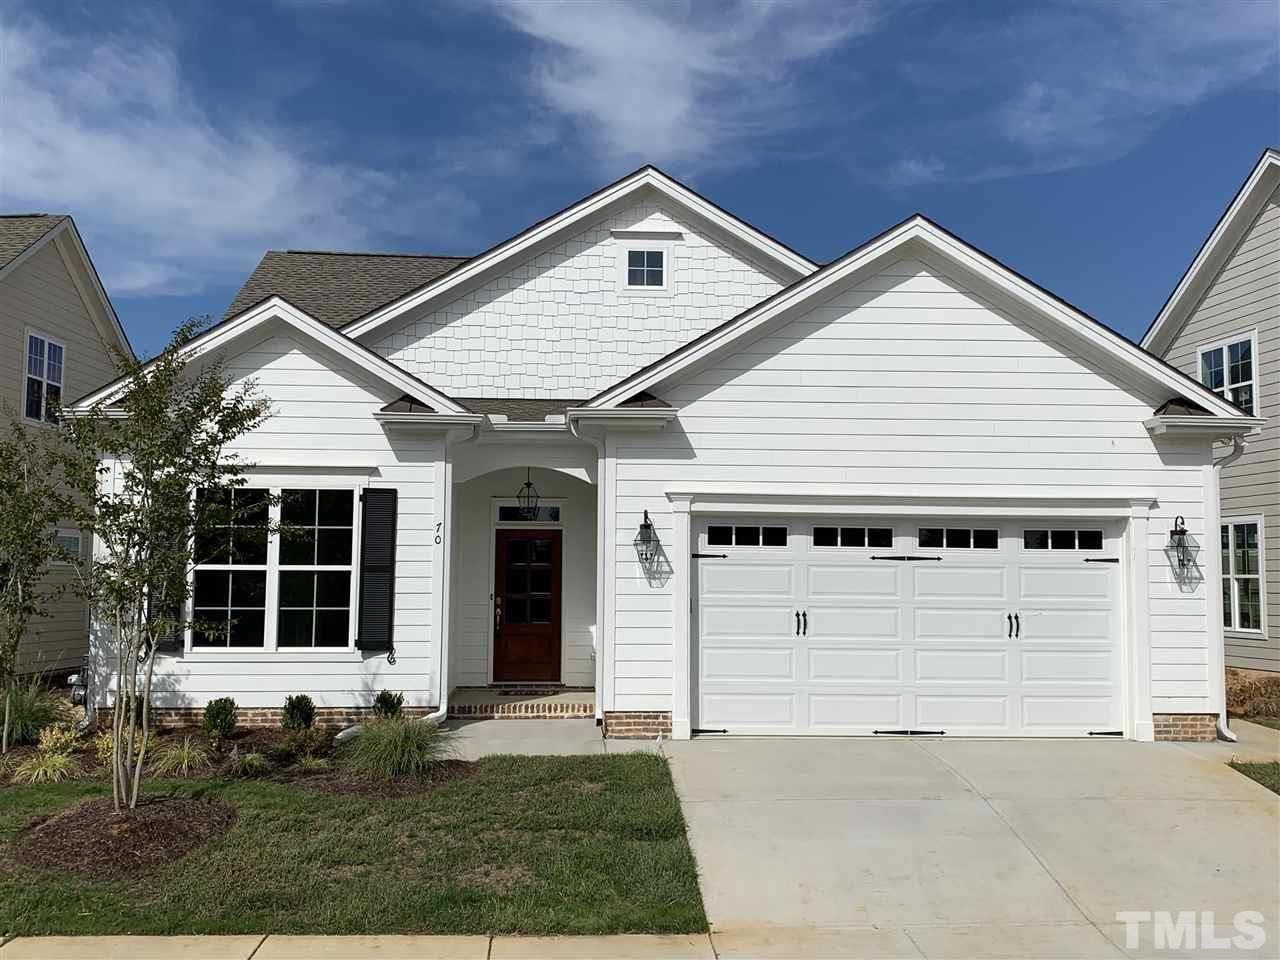 70 Sweetgrass Way, Clayton, NC 27527 - MLS#: 2256085